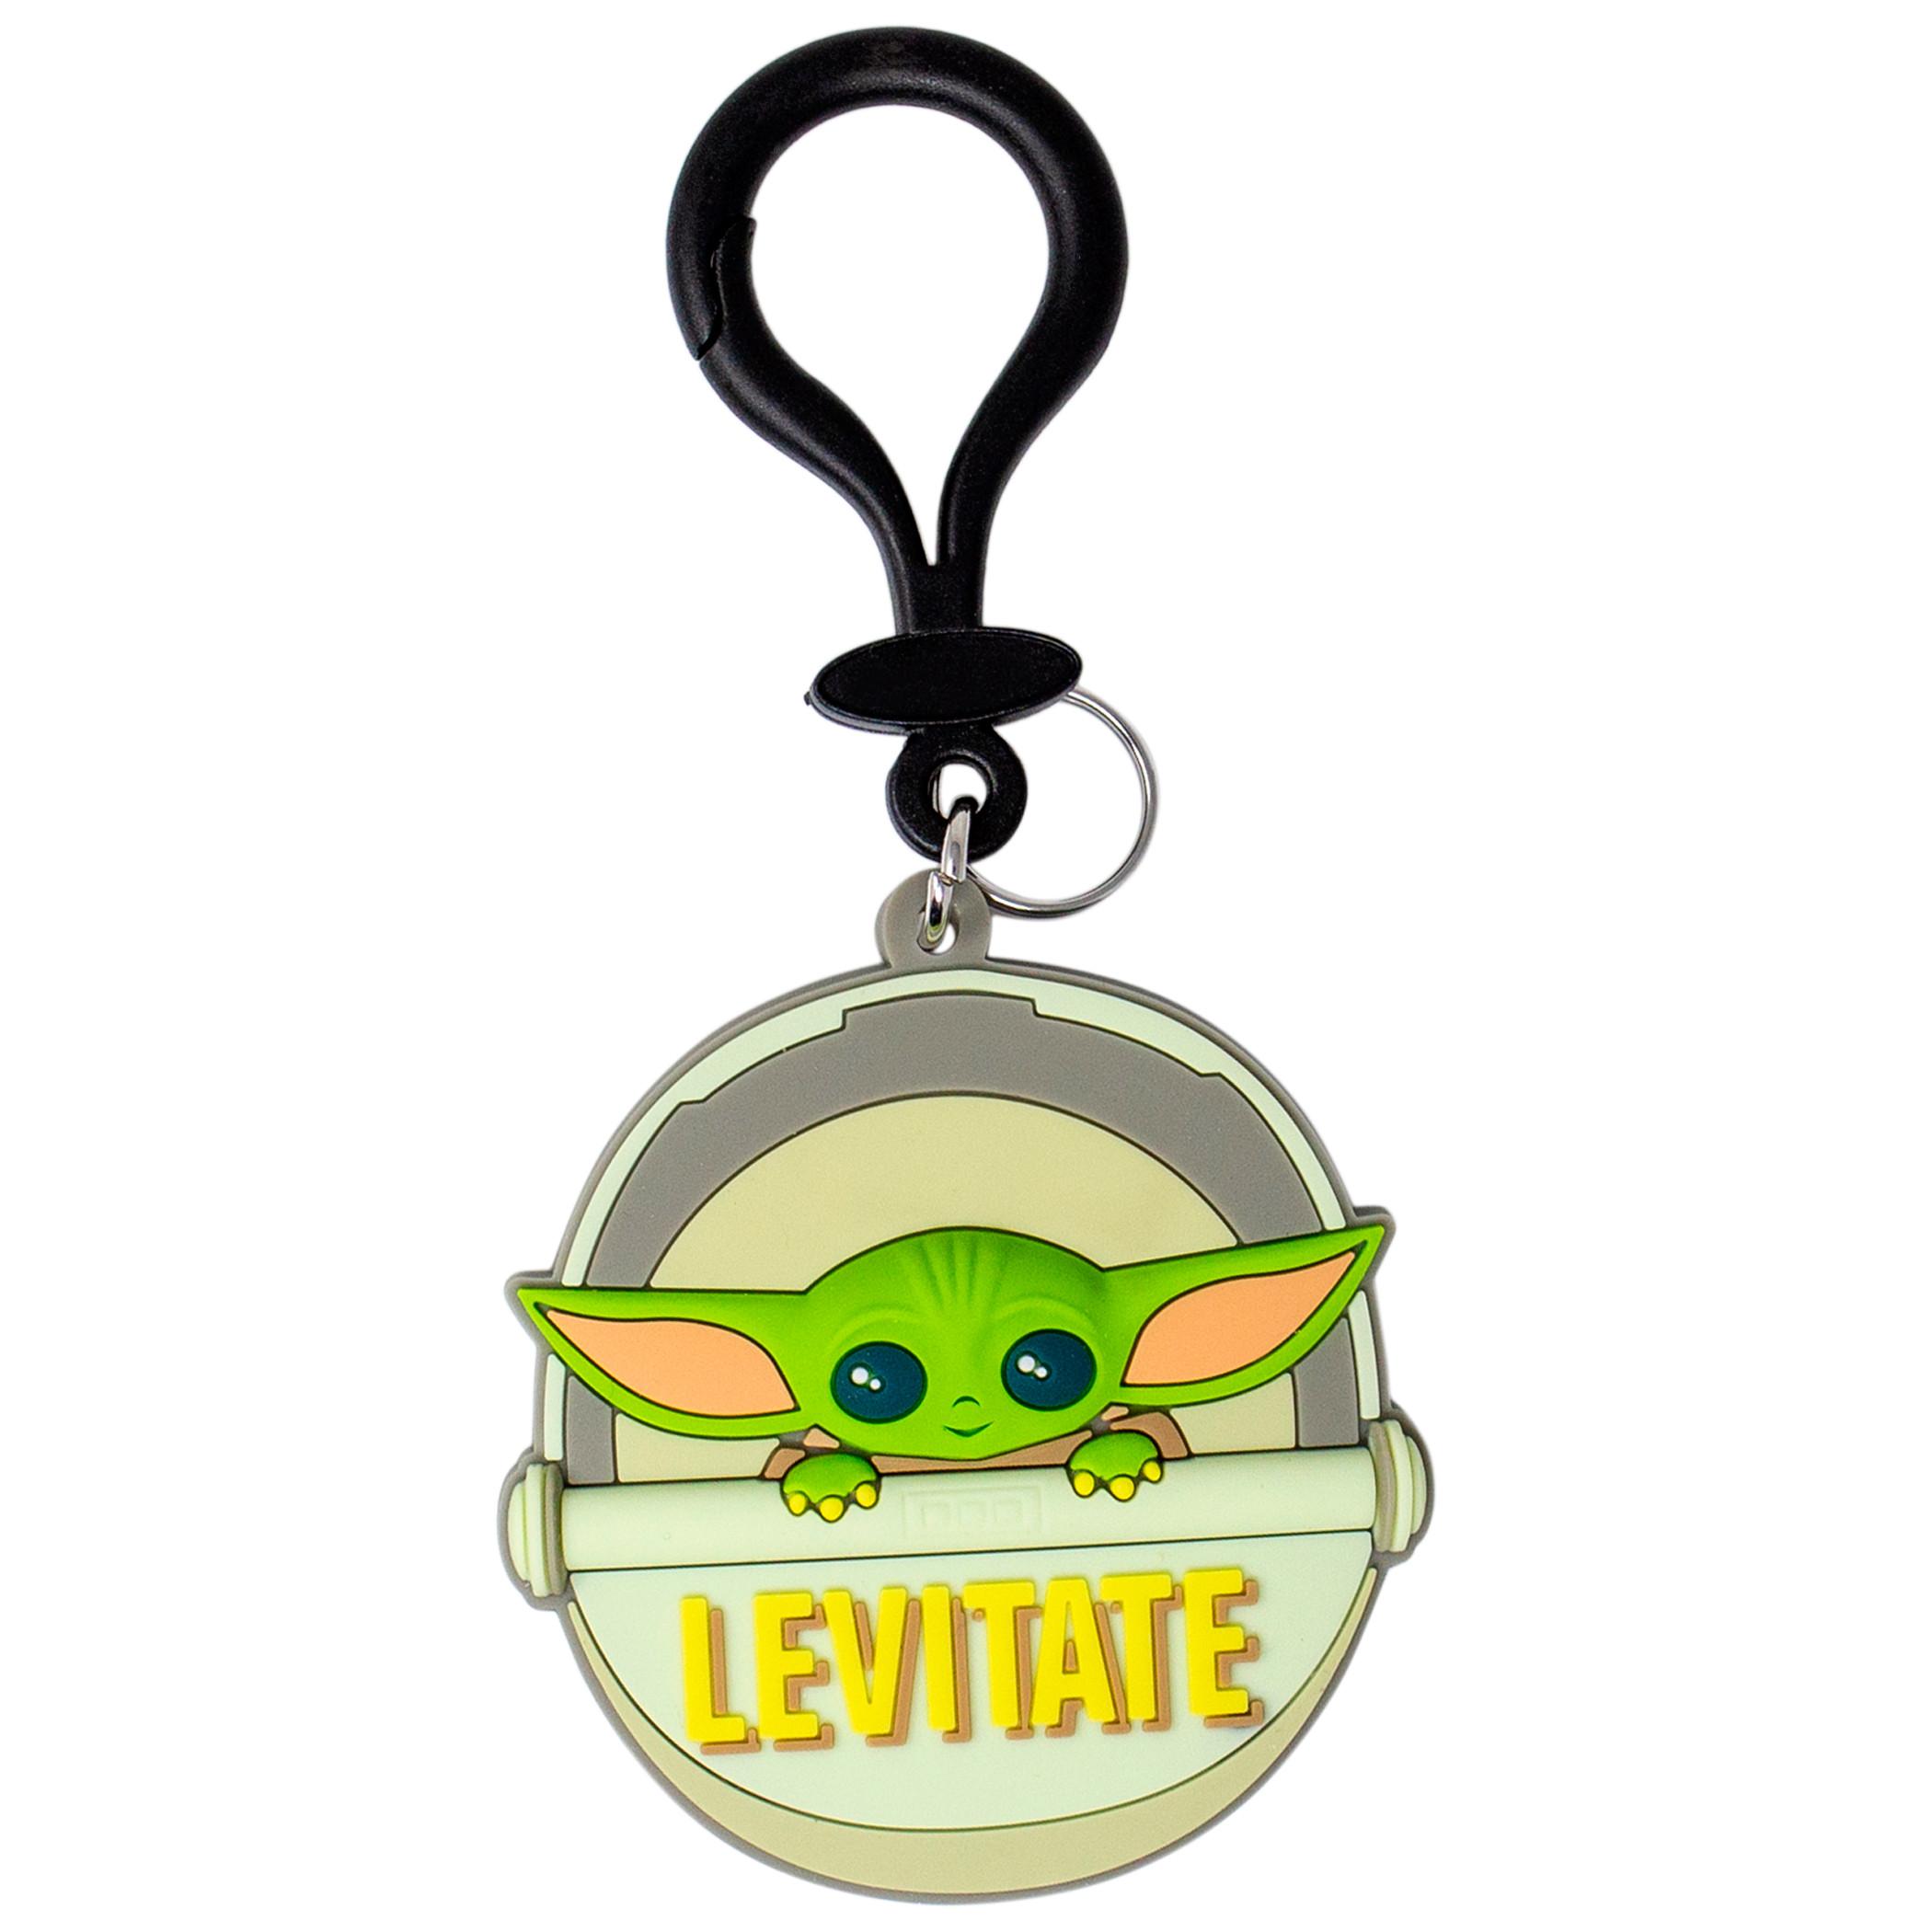 Star Wars The Child Levitate PVC Bag Clip